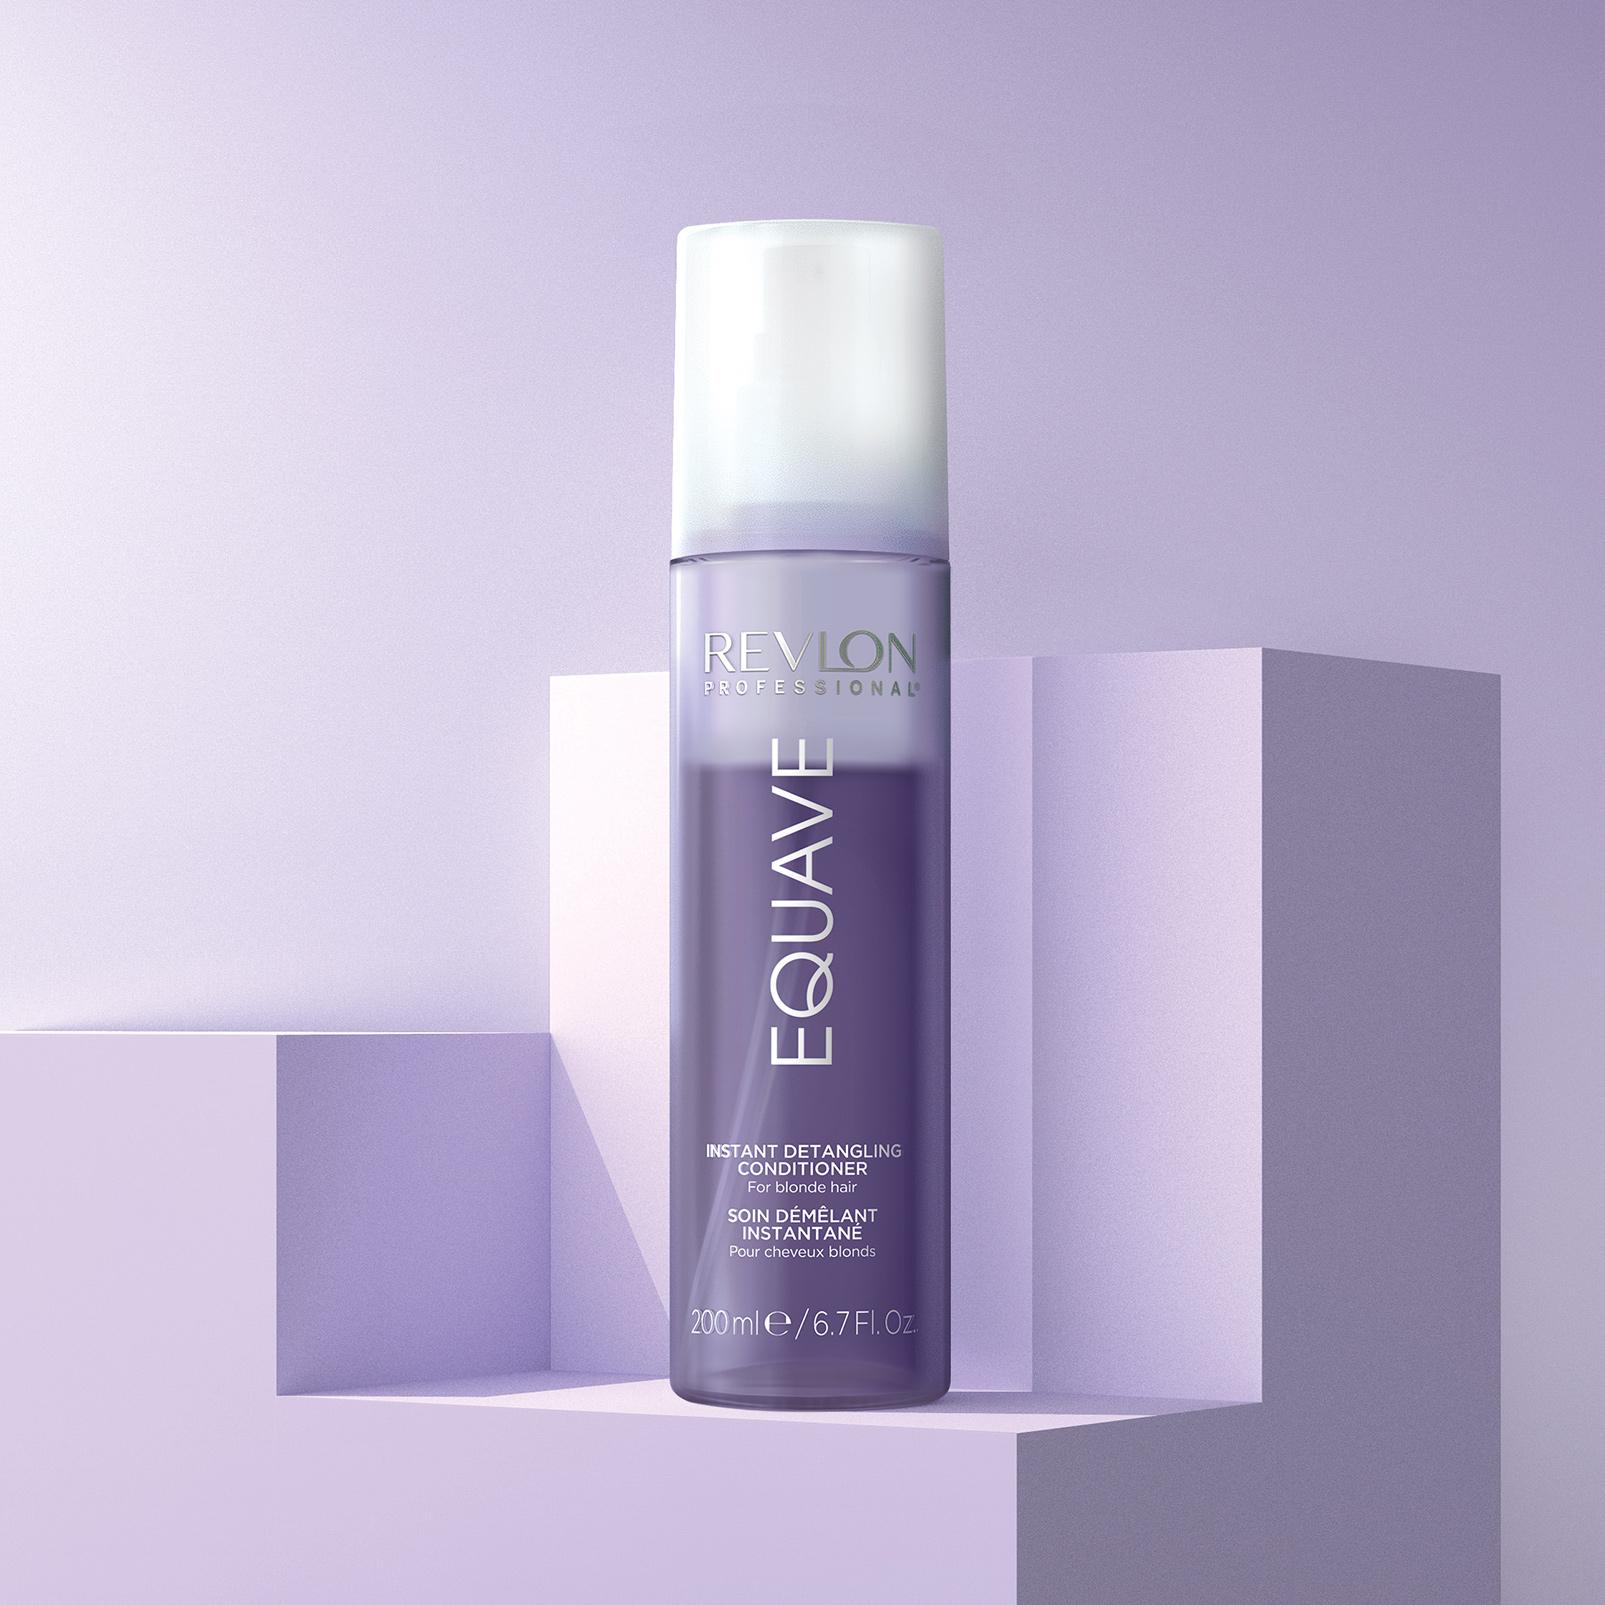 Revlon Equave Instant Beauty Blonde Detangling Conditioner 200ml